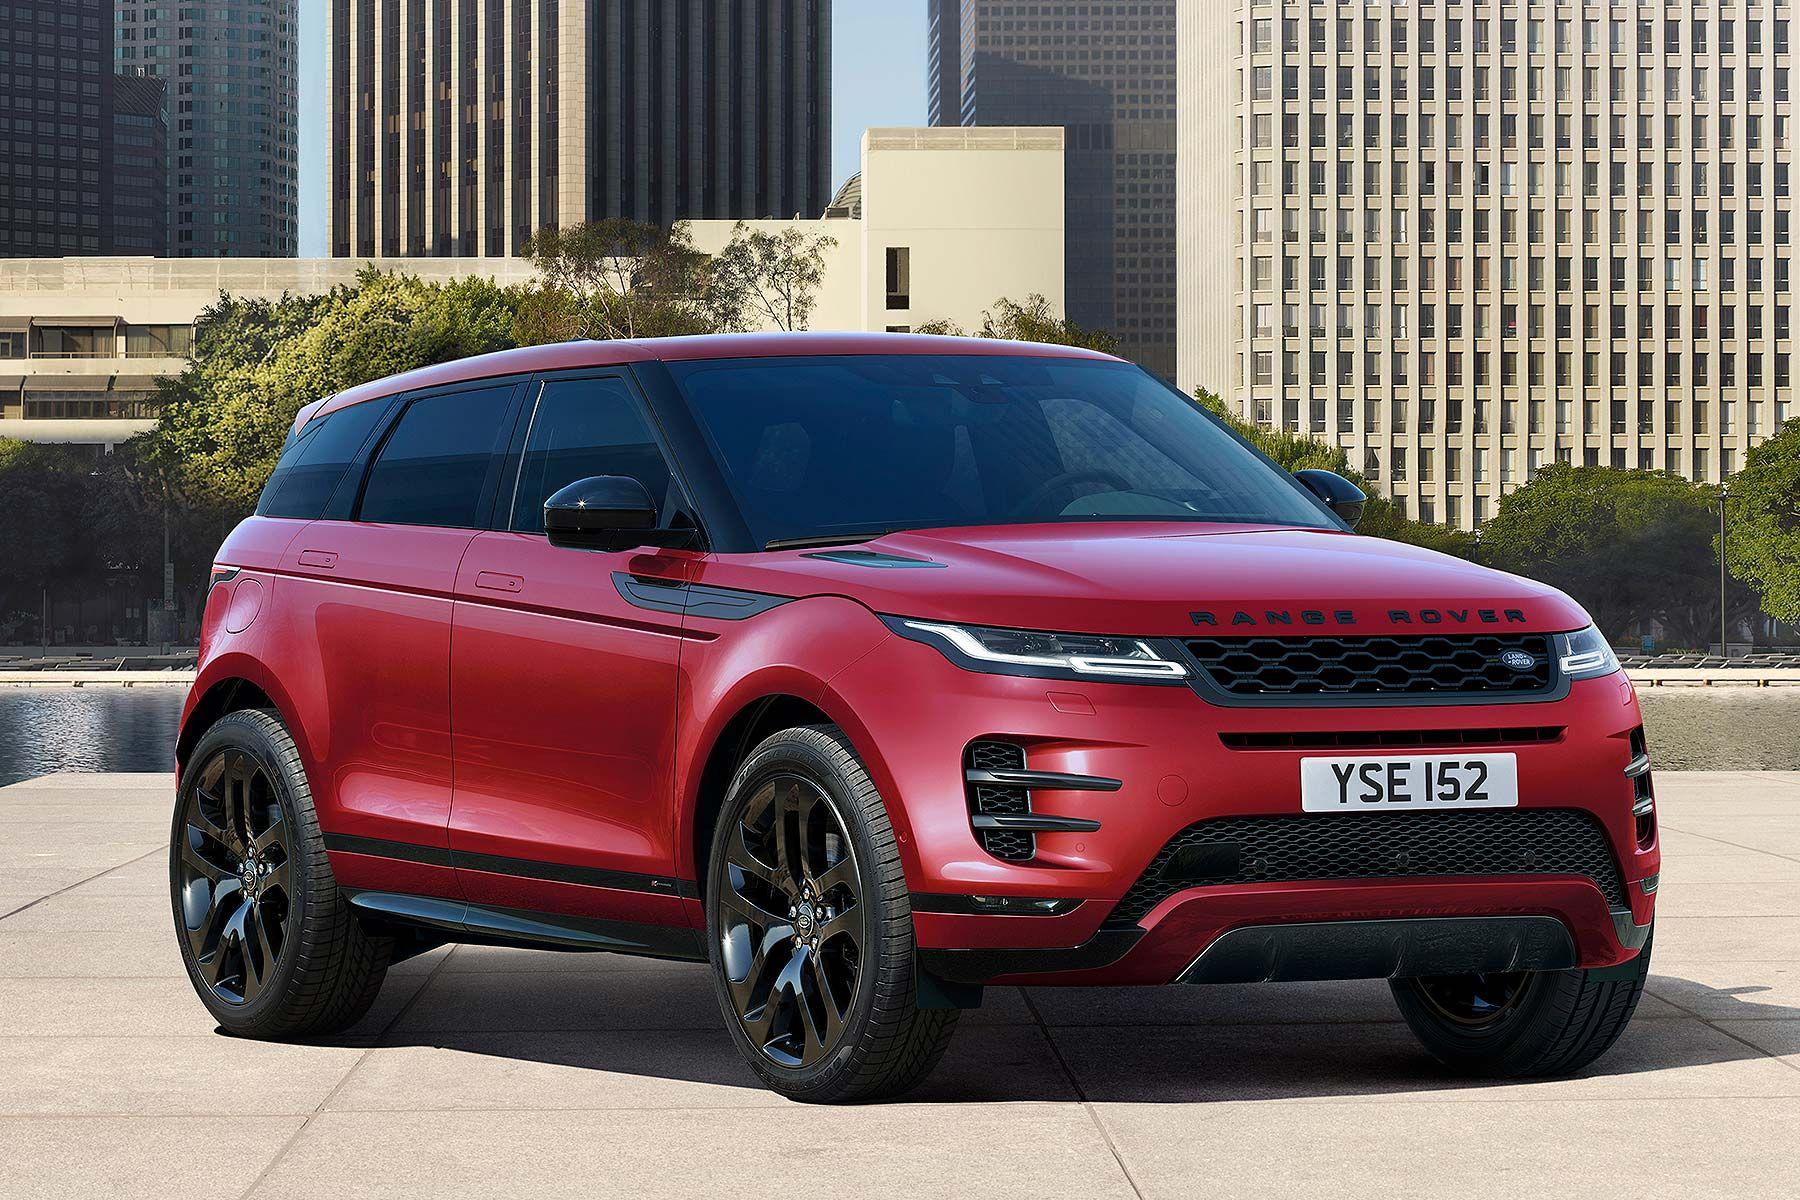 2019 Range Rover Evoque Range Rover Evoque